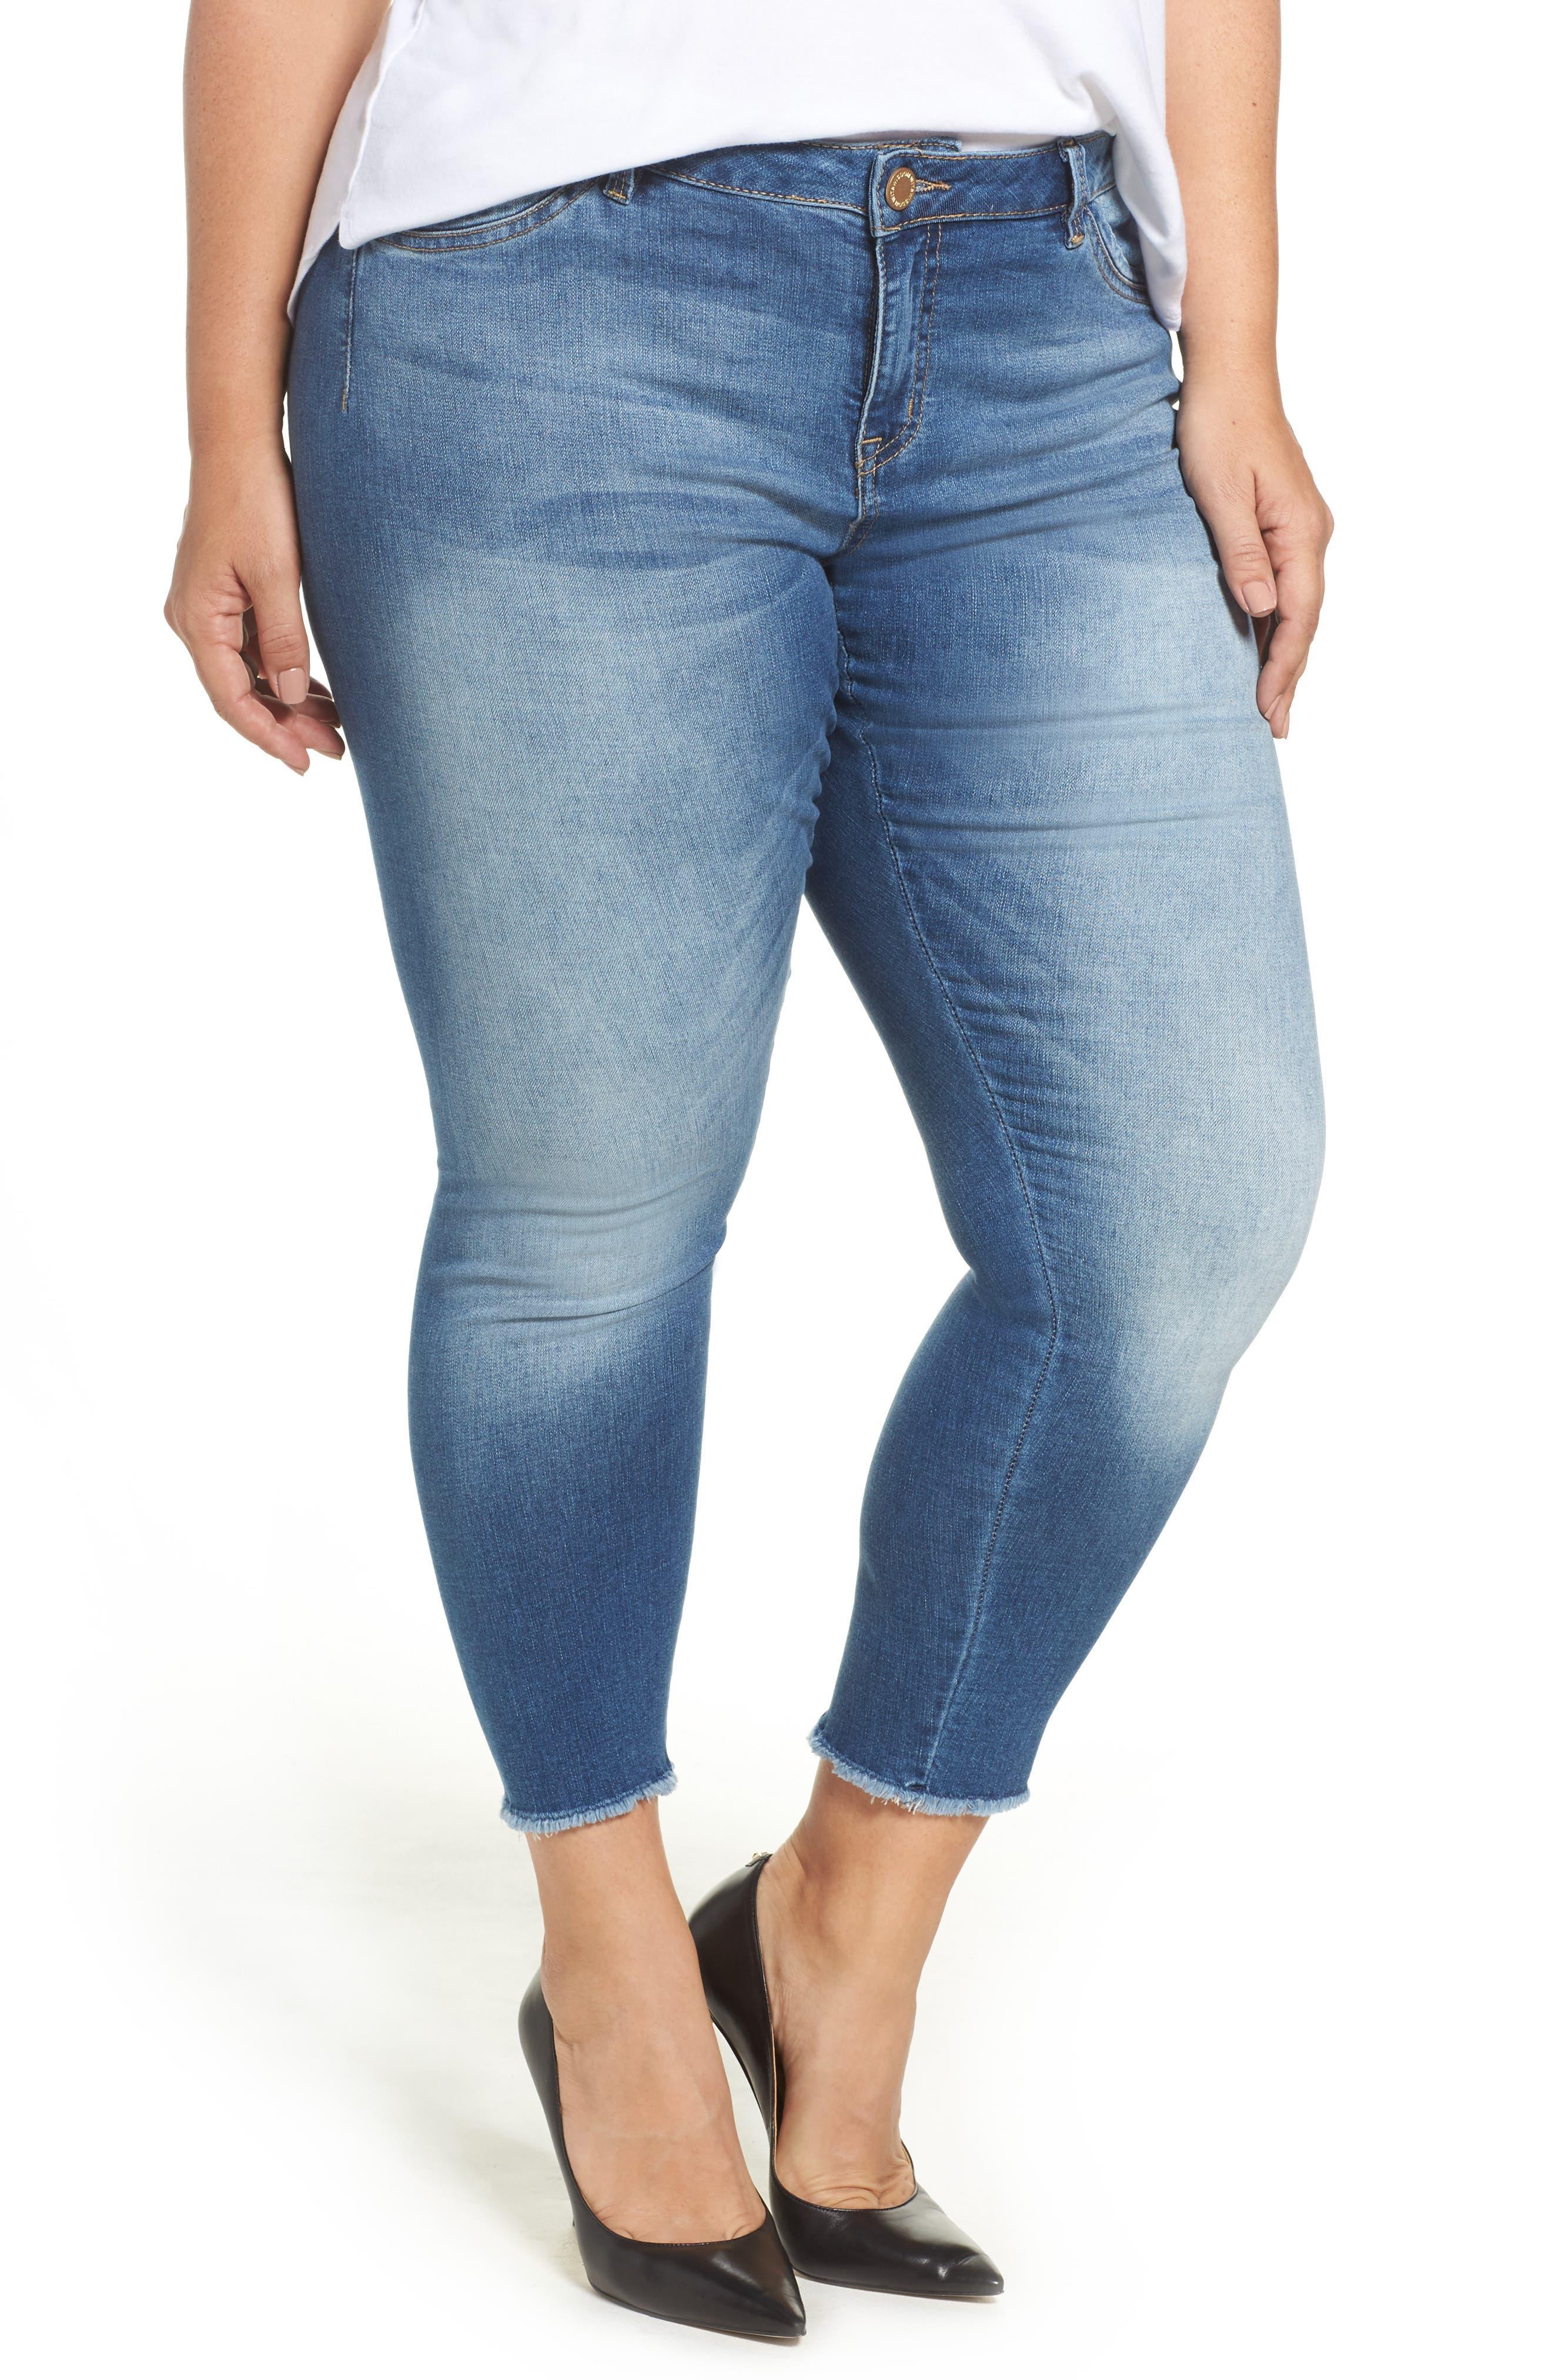 Alternate Image 1 Selected - Wit & Wisdom Frayed Hem Skinny Jeans (Plus Size) (Nordstrom Exclusive)